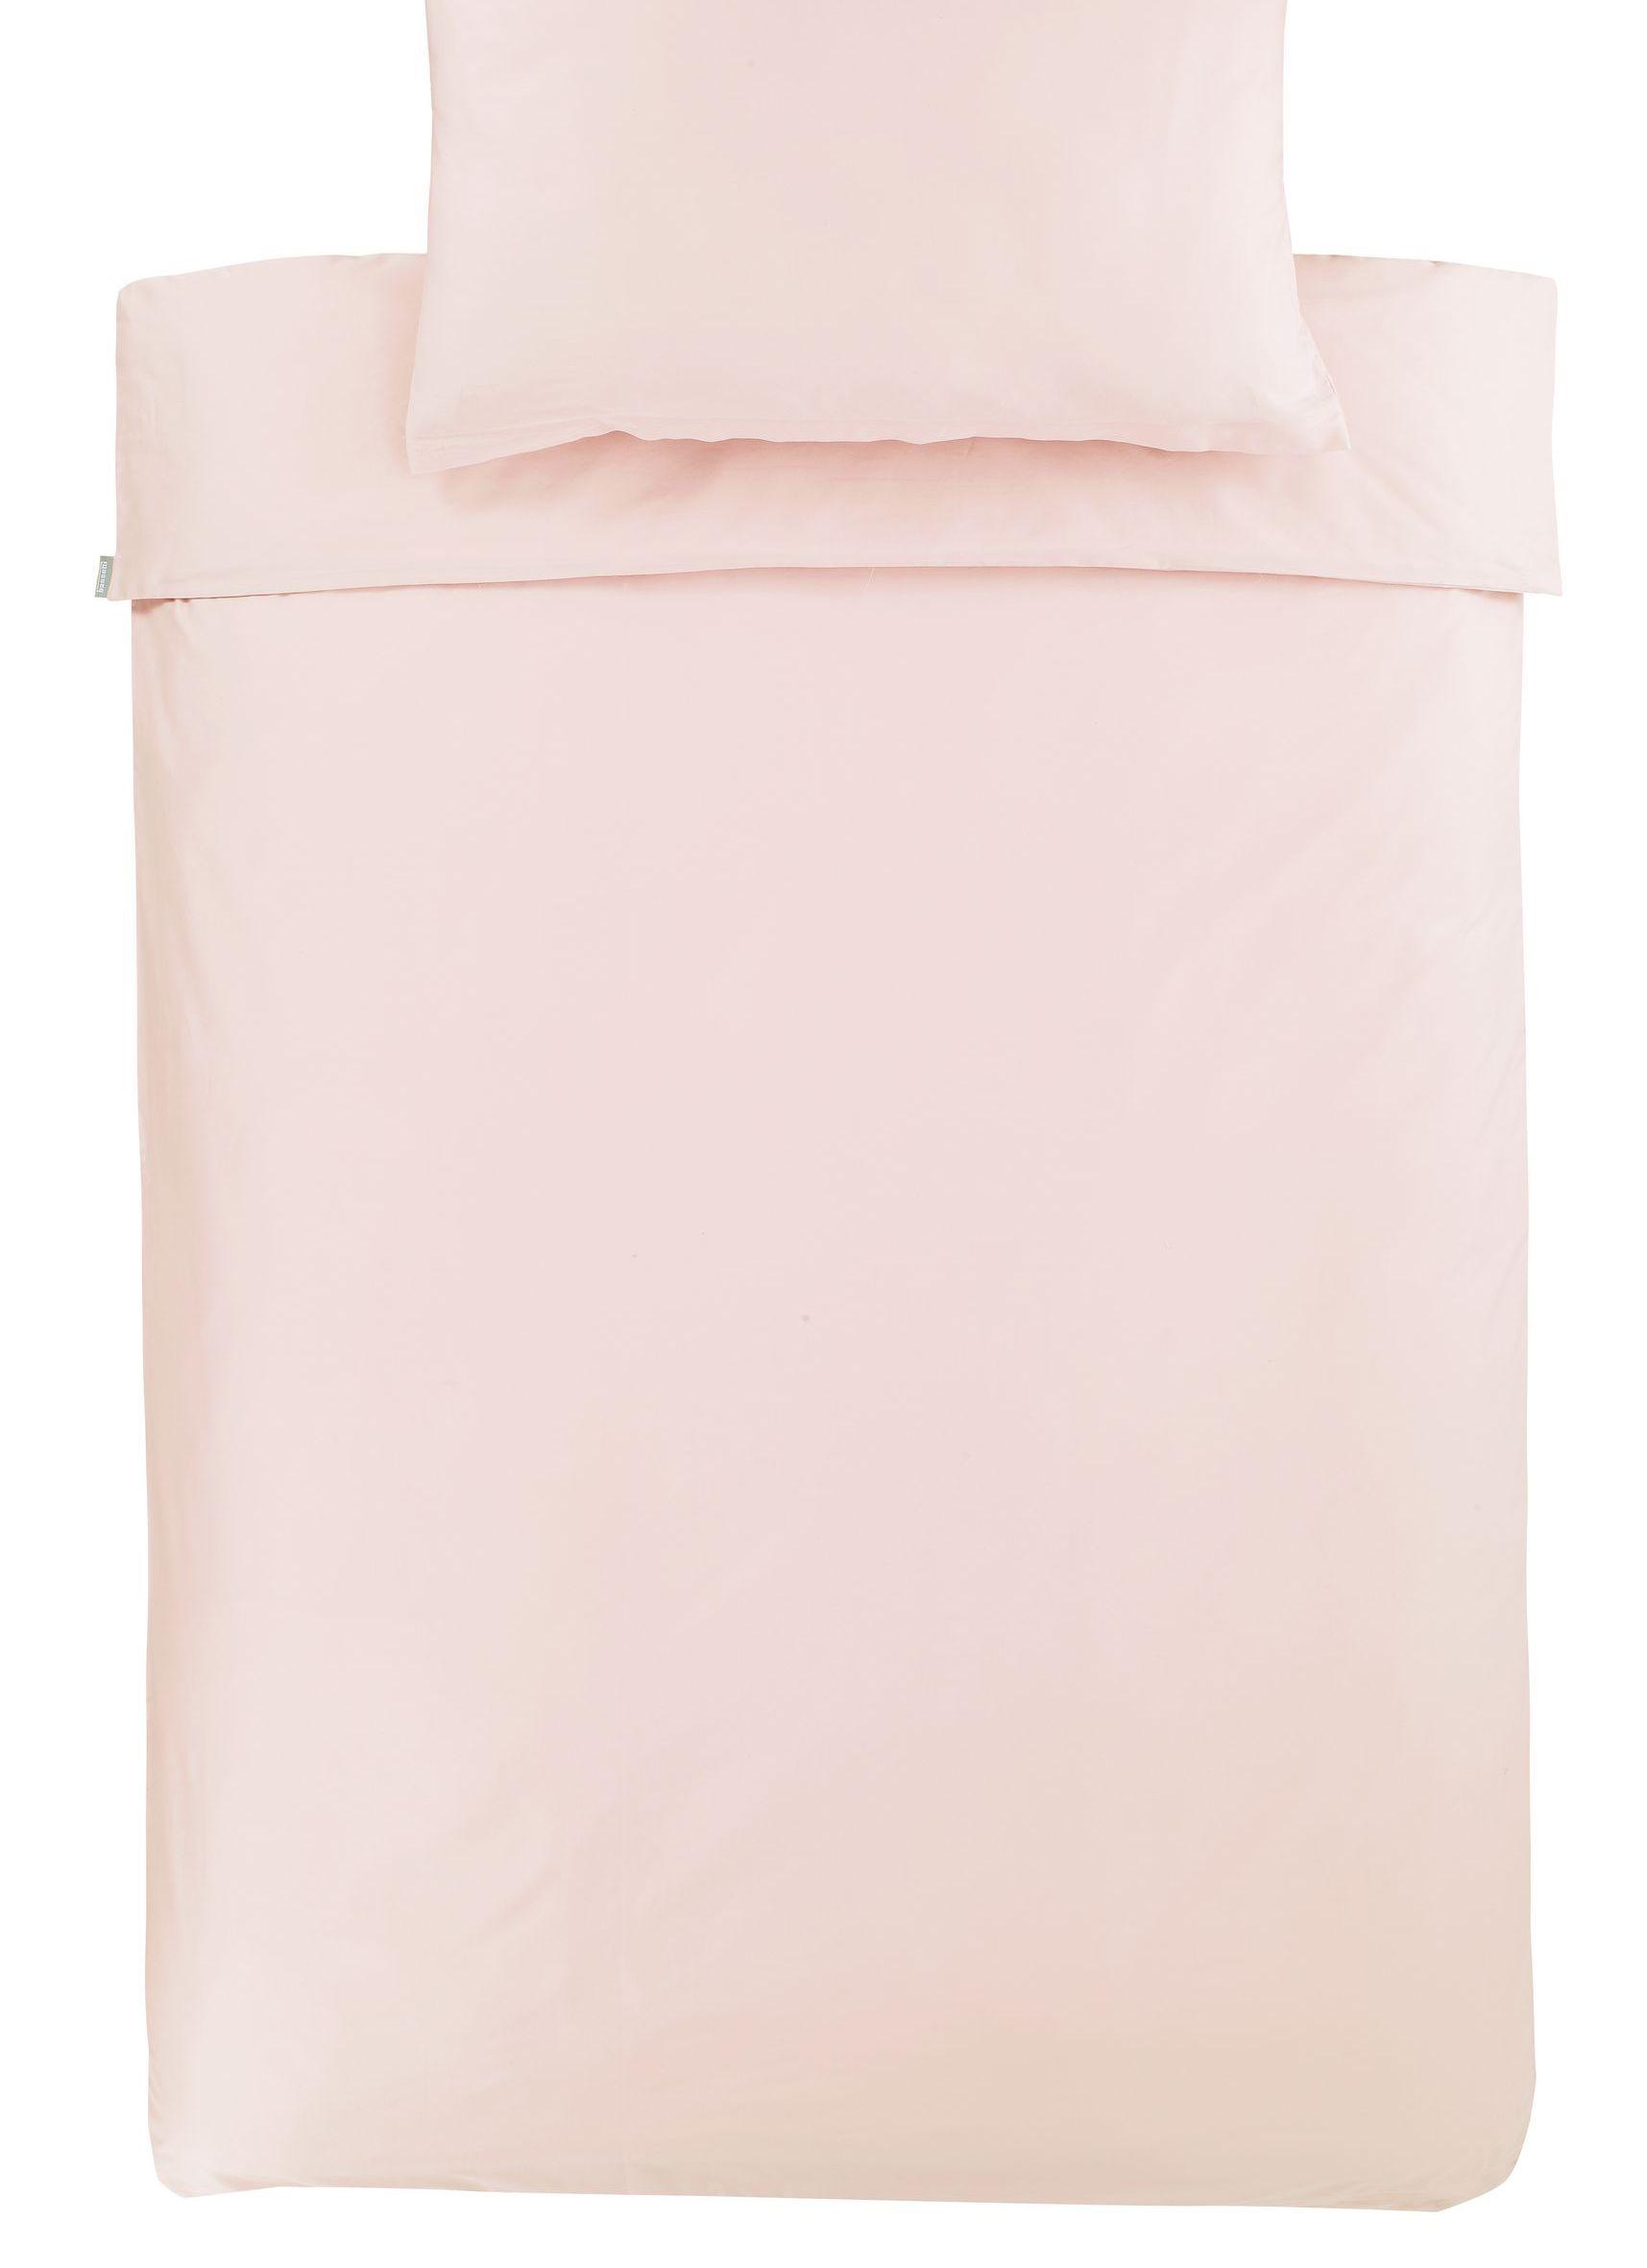 Bassetti Uni Satin Bettwäsche Oder Kissenhüllen Zum Kombinieren